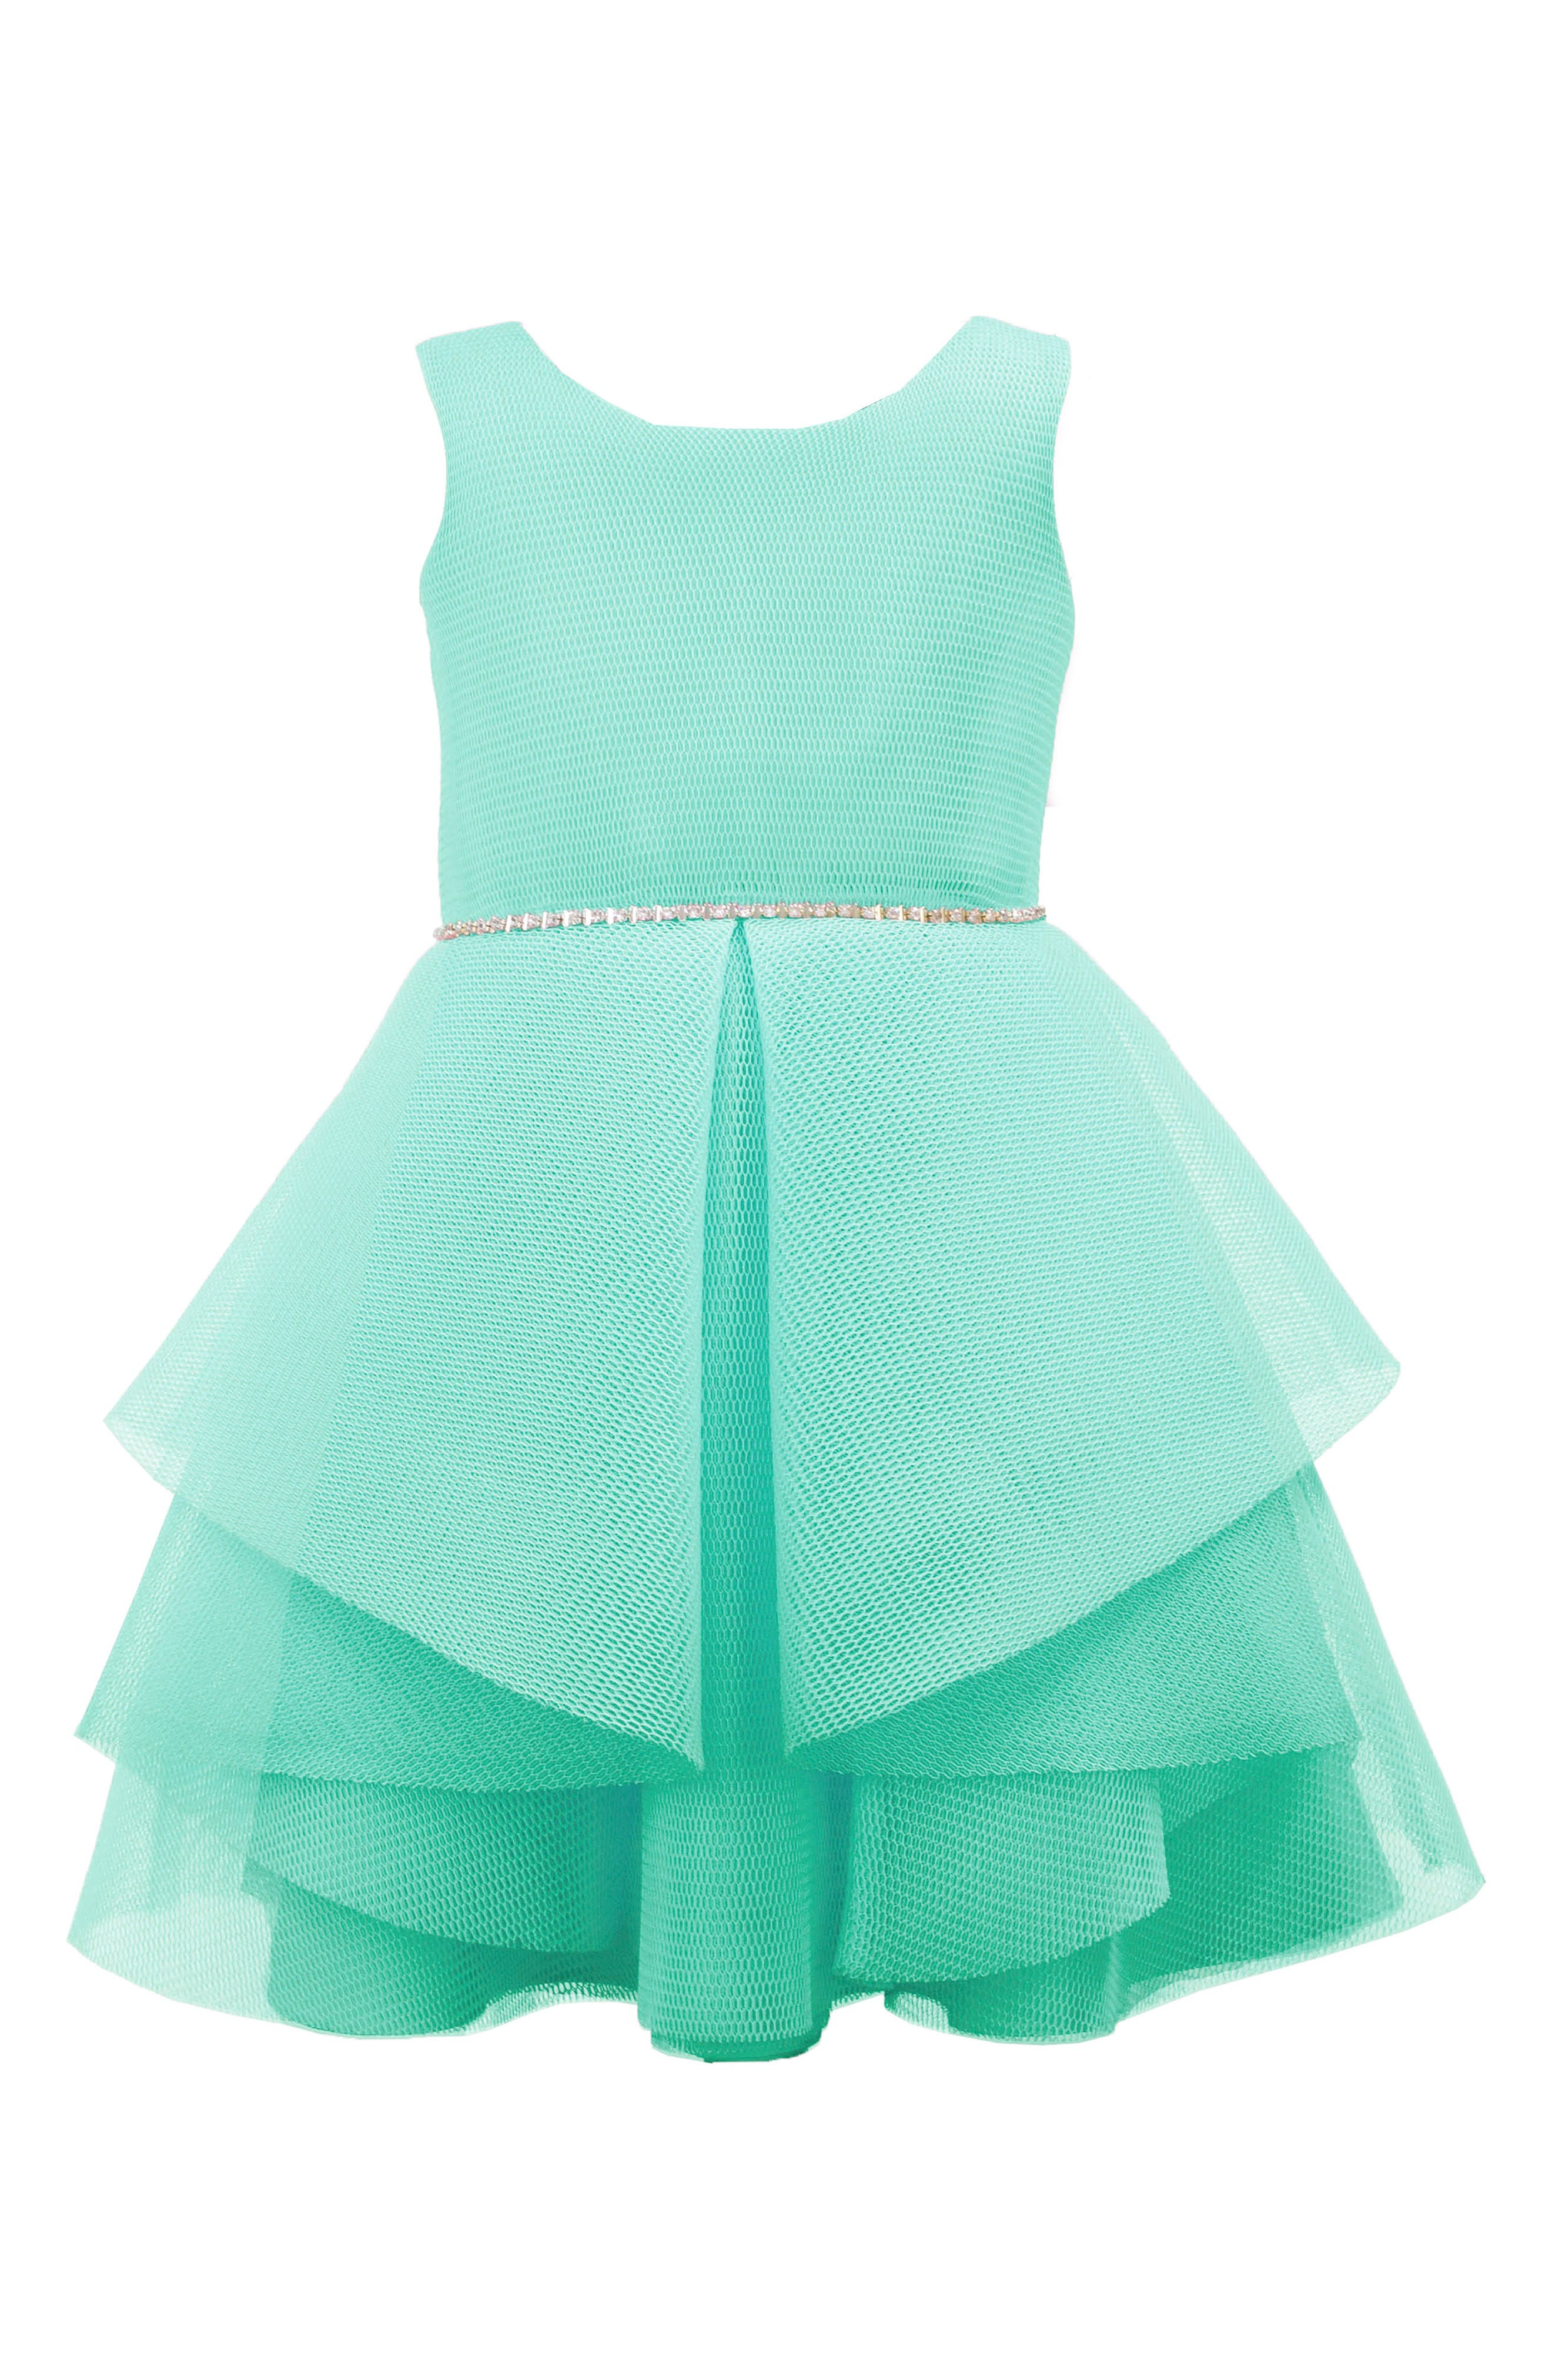 Main Image - David Charles Techno Mesh Fit & Flare Dress (Toddler Girls, Little Girls & Big Girls)